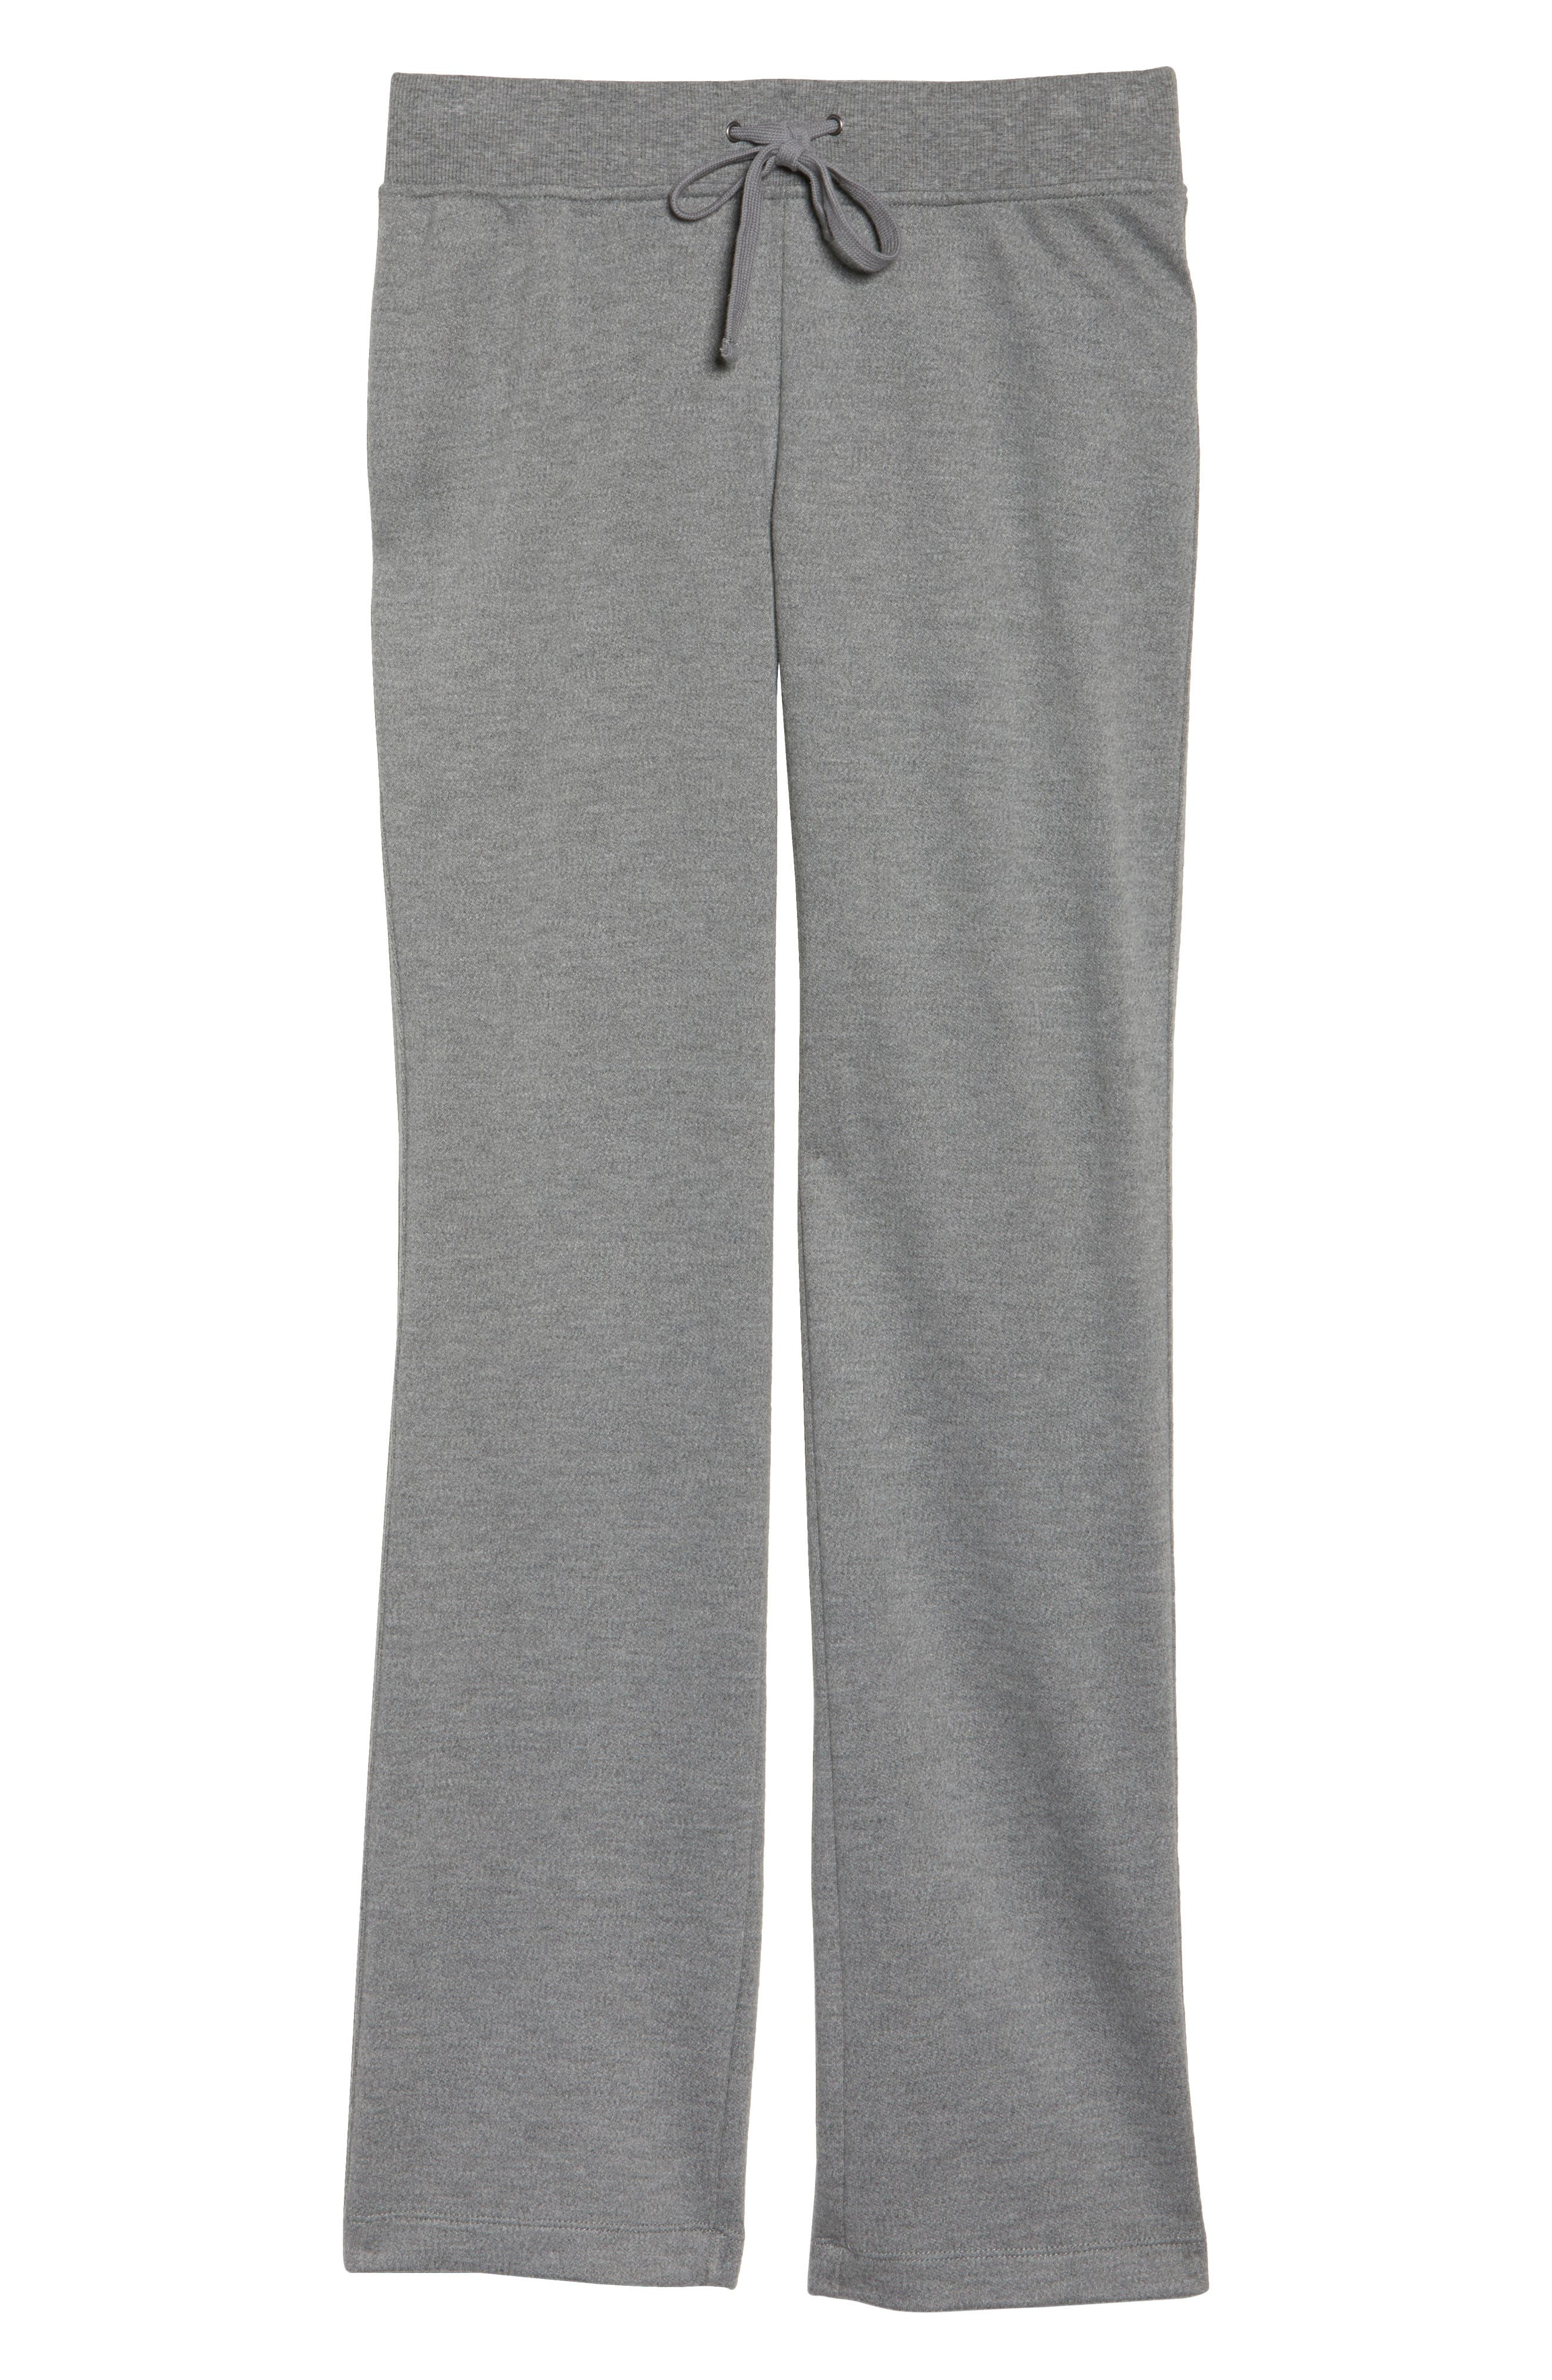 Penny Lounge Pants,                             Alternate thumbnail 4, color,                             Grey Heather